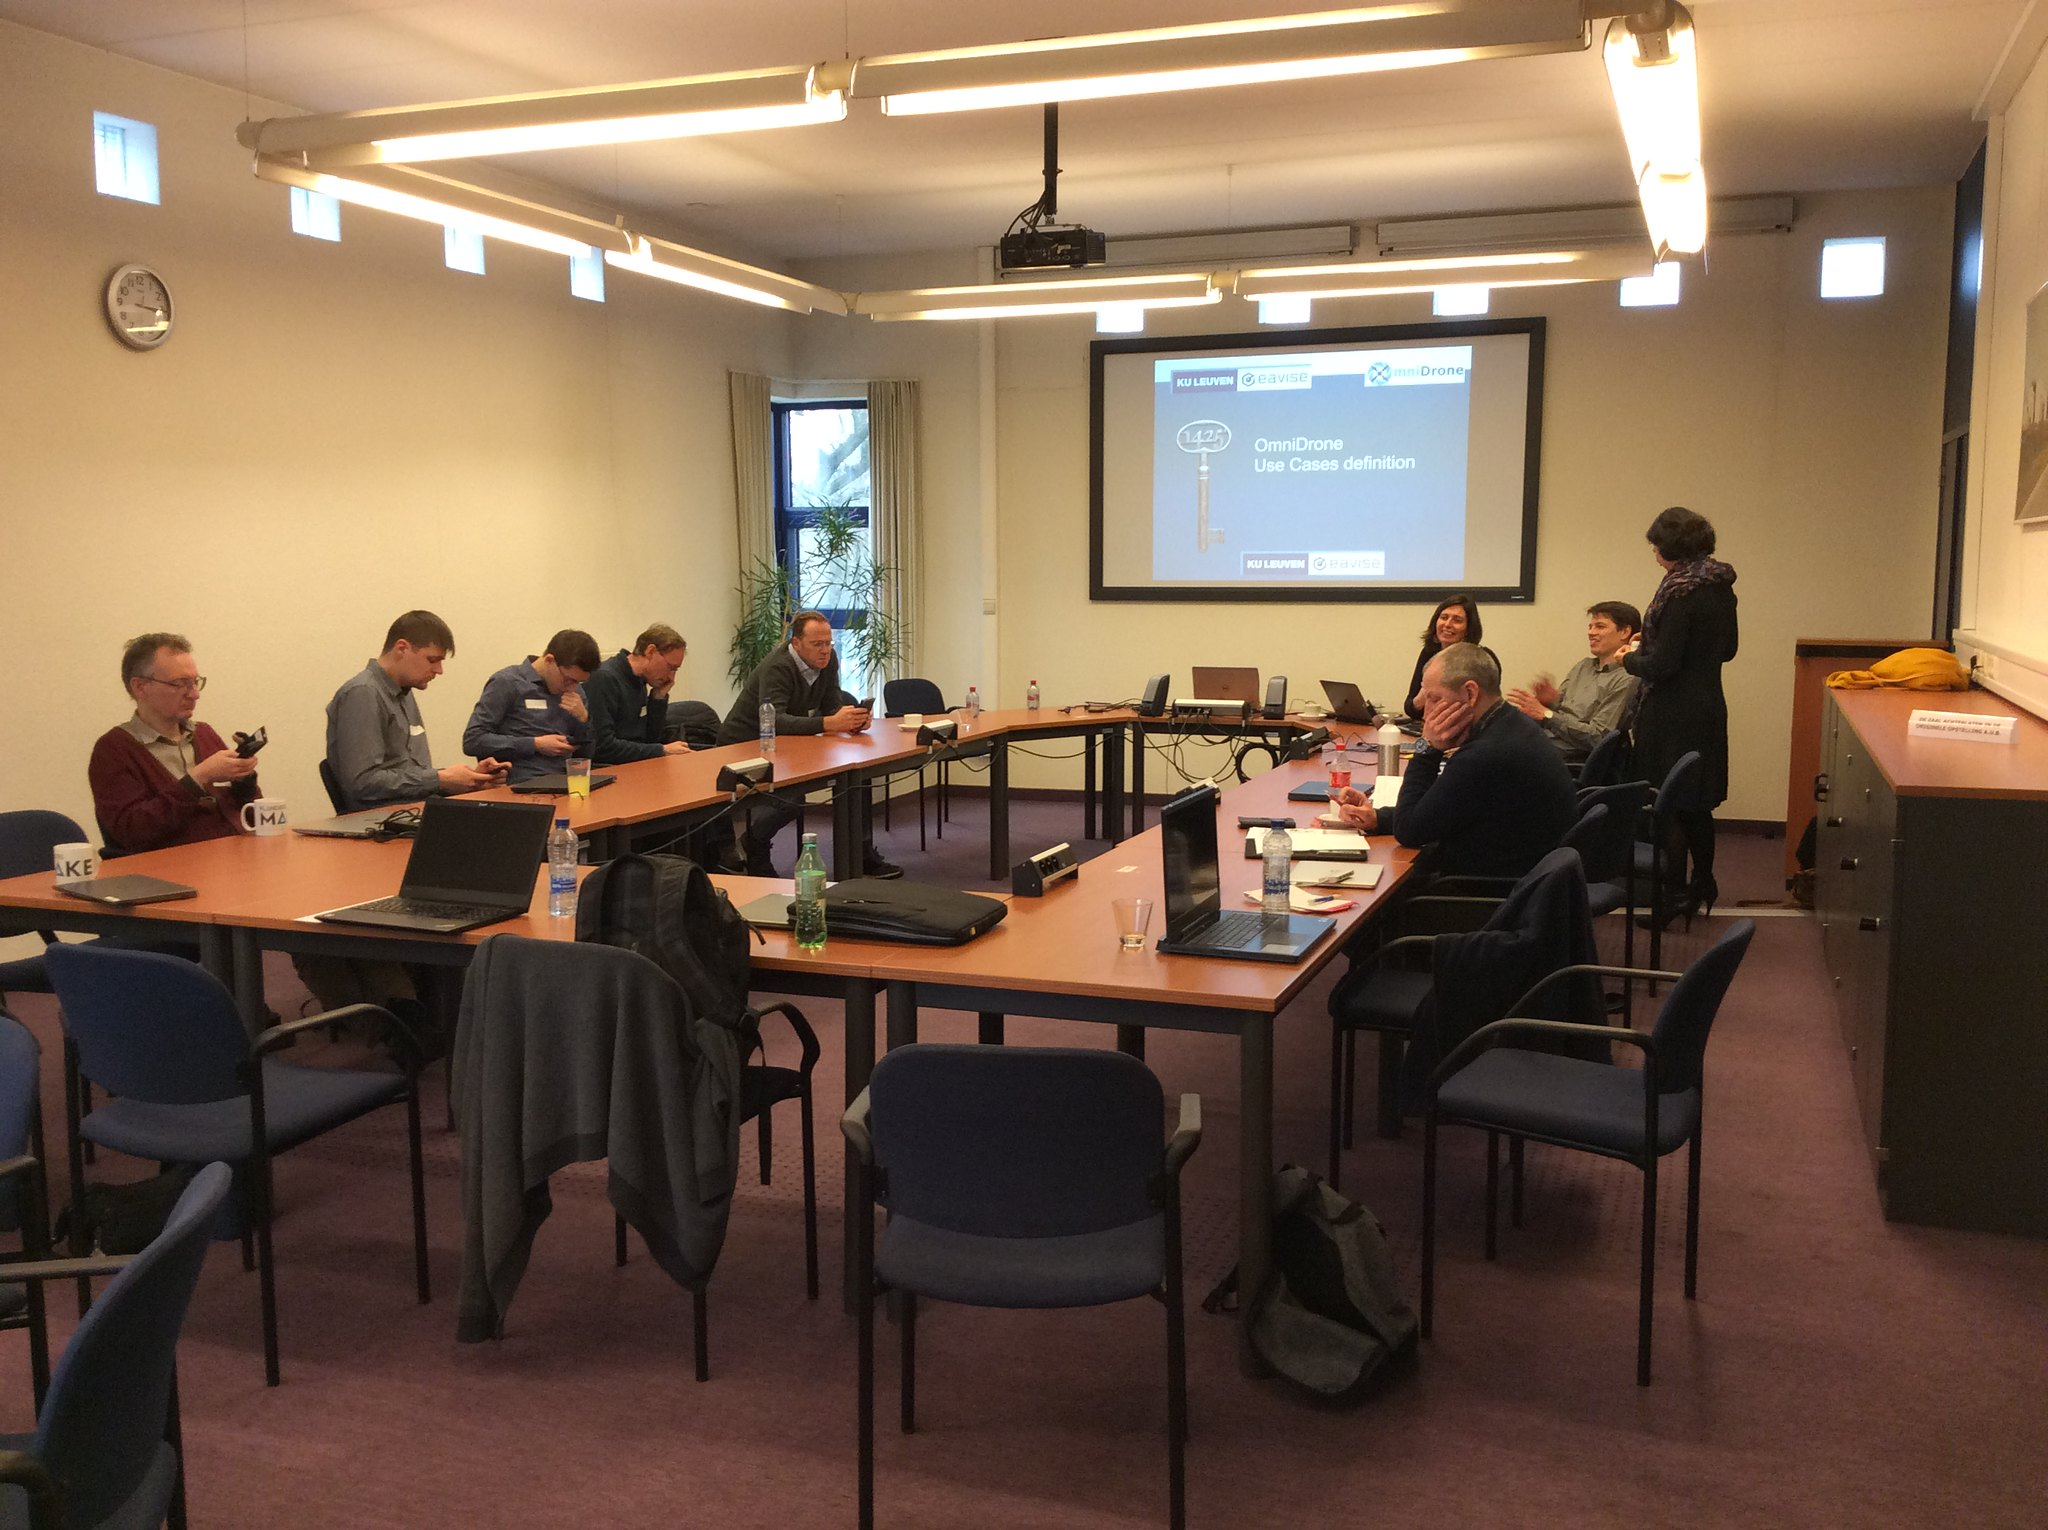 20200228 - 4th OmniDrone Advisory Board meeting